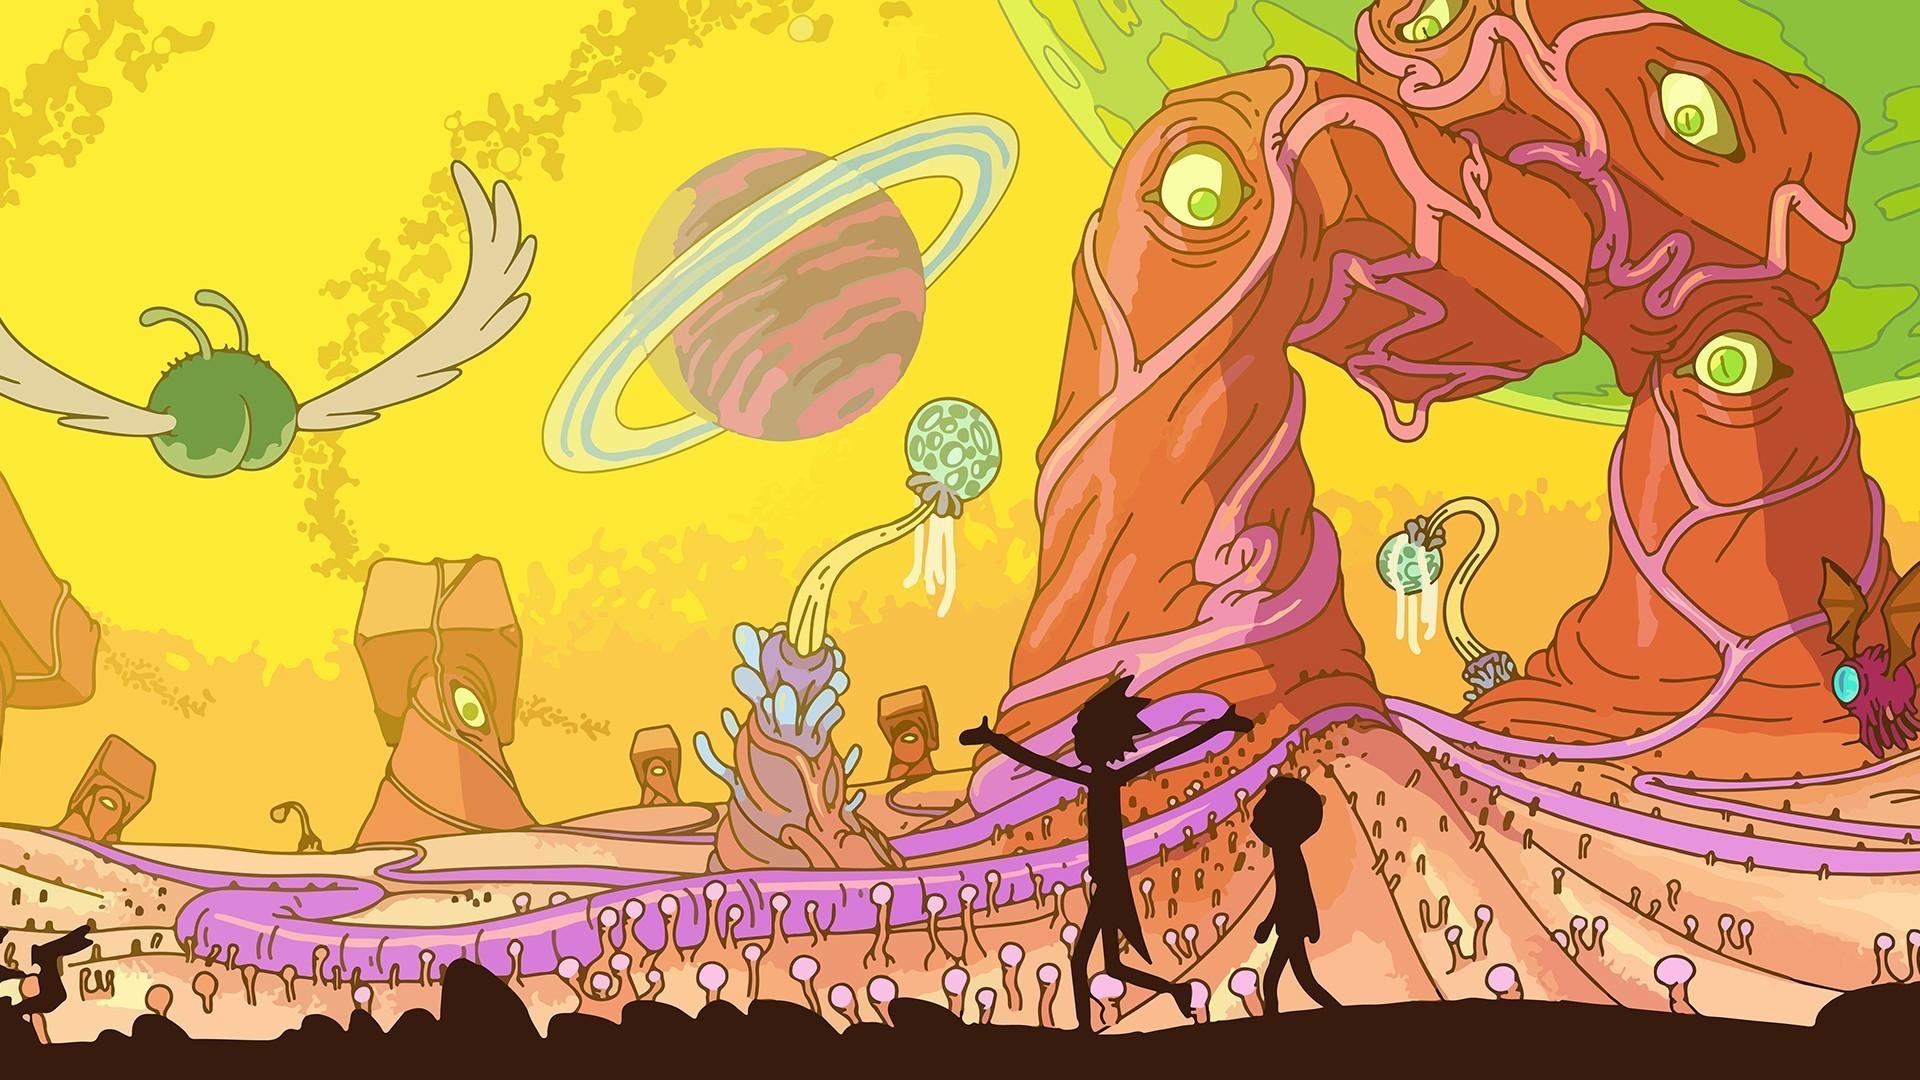 Gravity Falls Wallpaper Dump Rick And Morty Wallpaper 1920x1080 183 ① Download Free